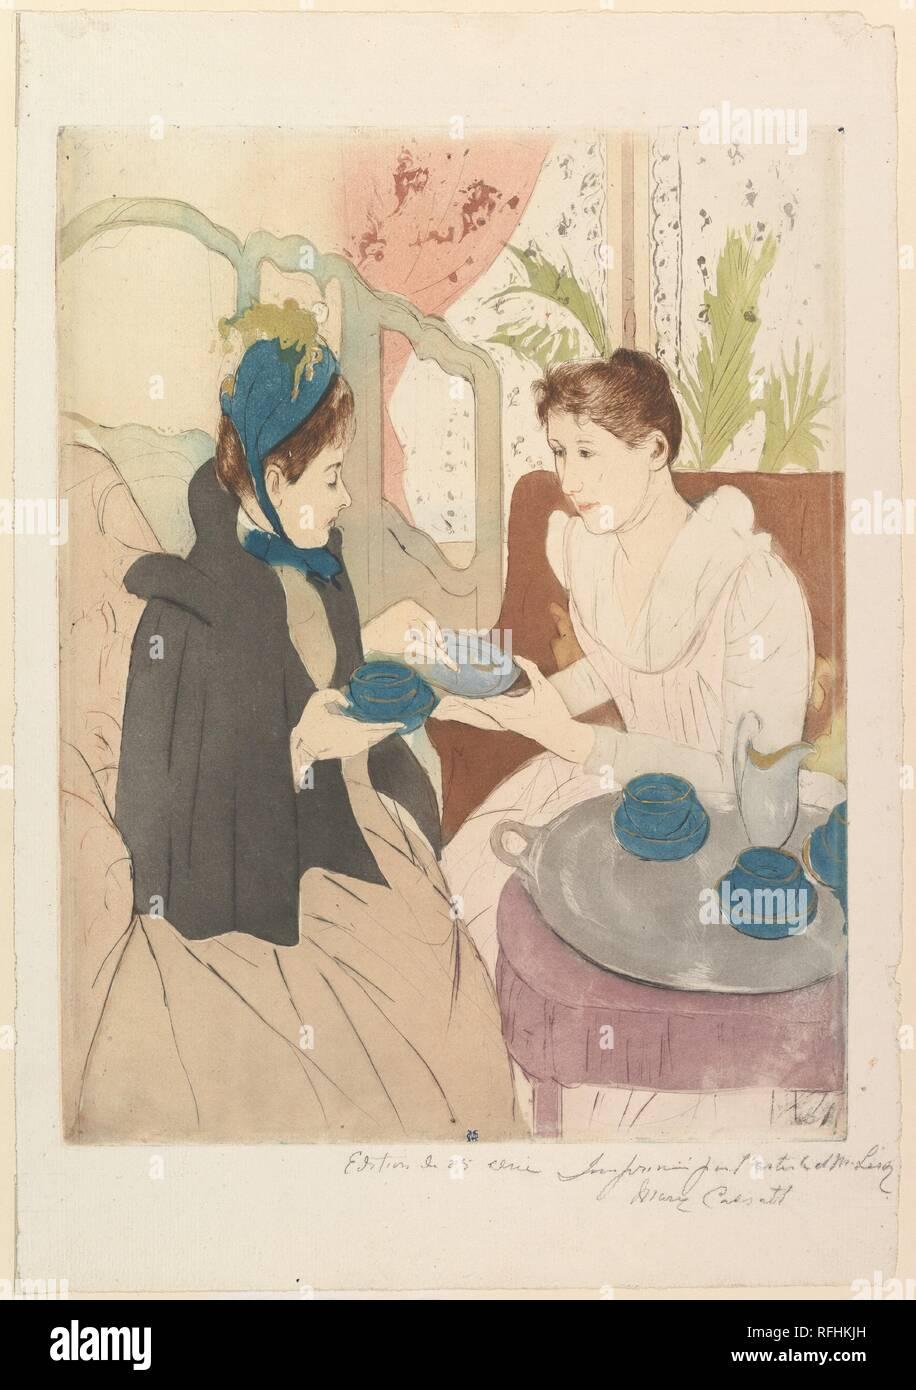 Afternoon Tea Party. Artist: Mary Cassatt (Amerikanische, Pittsburgh, Pennsylvania 1844-1926 Le Mesnil-Théribus herum, Oise). Abmessungen: Platte: 13 5/8 x 10 1/2 in. (34,6 x 26,7 cm) Blatt: 17 1/16 x 11 3/4 in. (43,3 x 29,8 cm). Datum: 1890-91. Museum: Metropolitan Museum of Art, New York, USA. Stockfoto